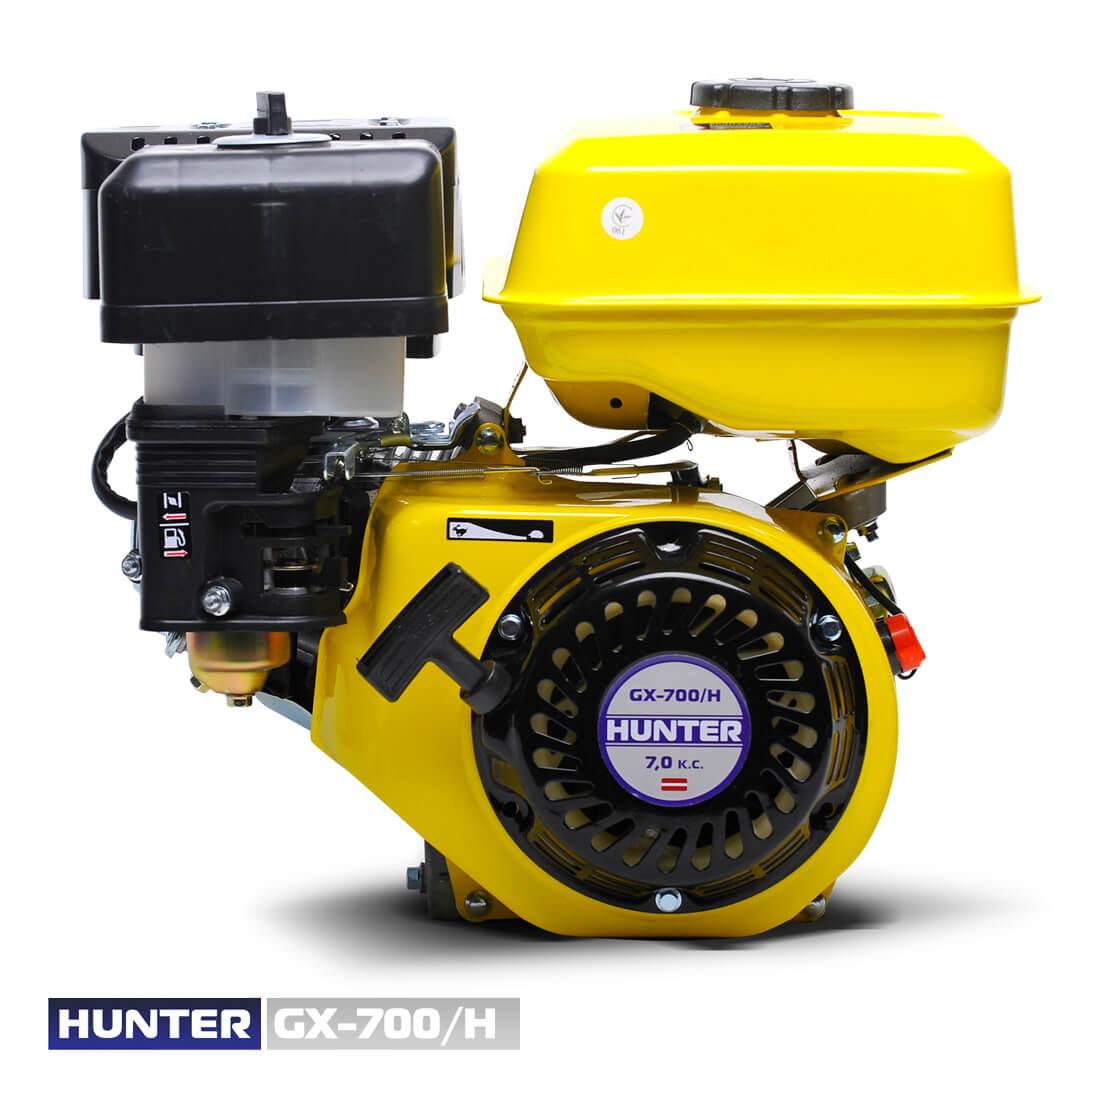 Фото GX-700/H (шлиц) цена 3500грн №2 — Hunter